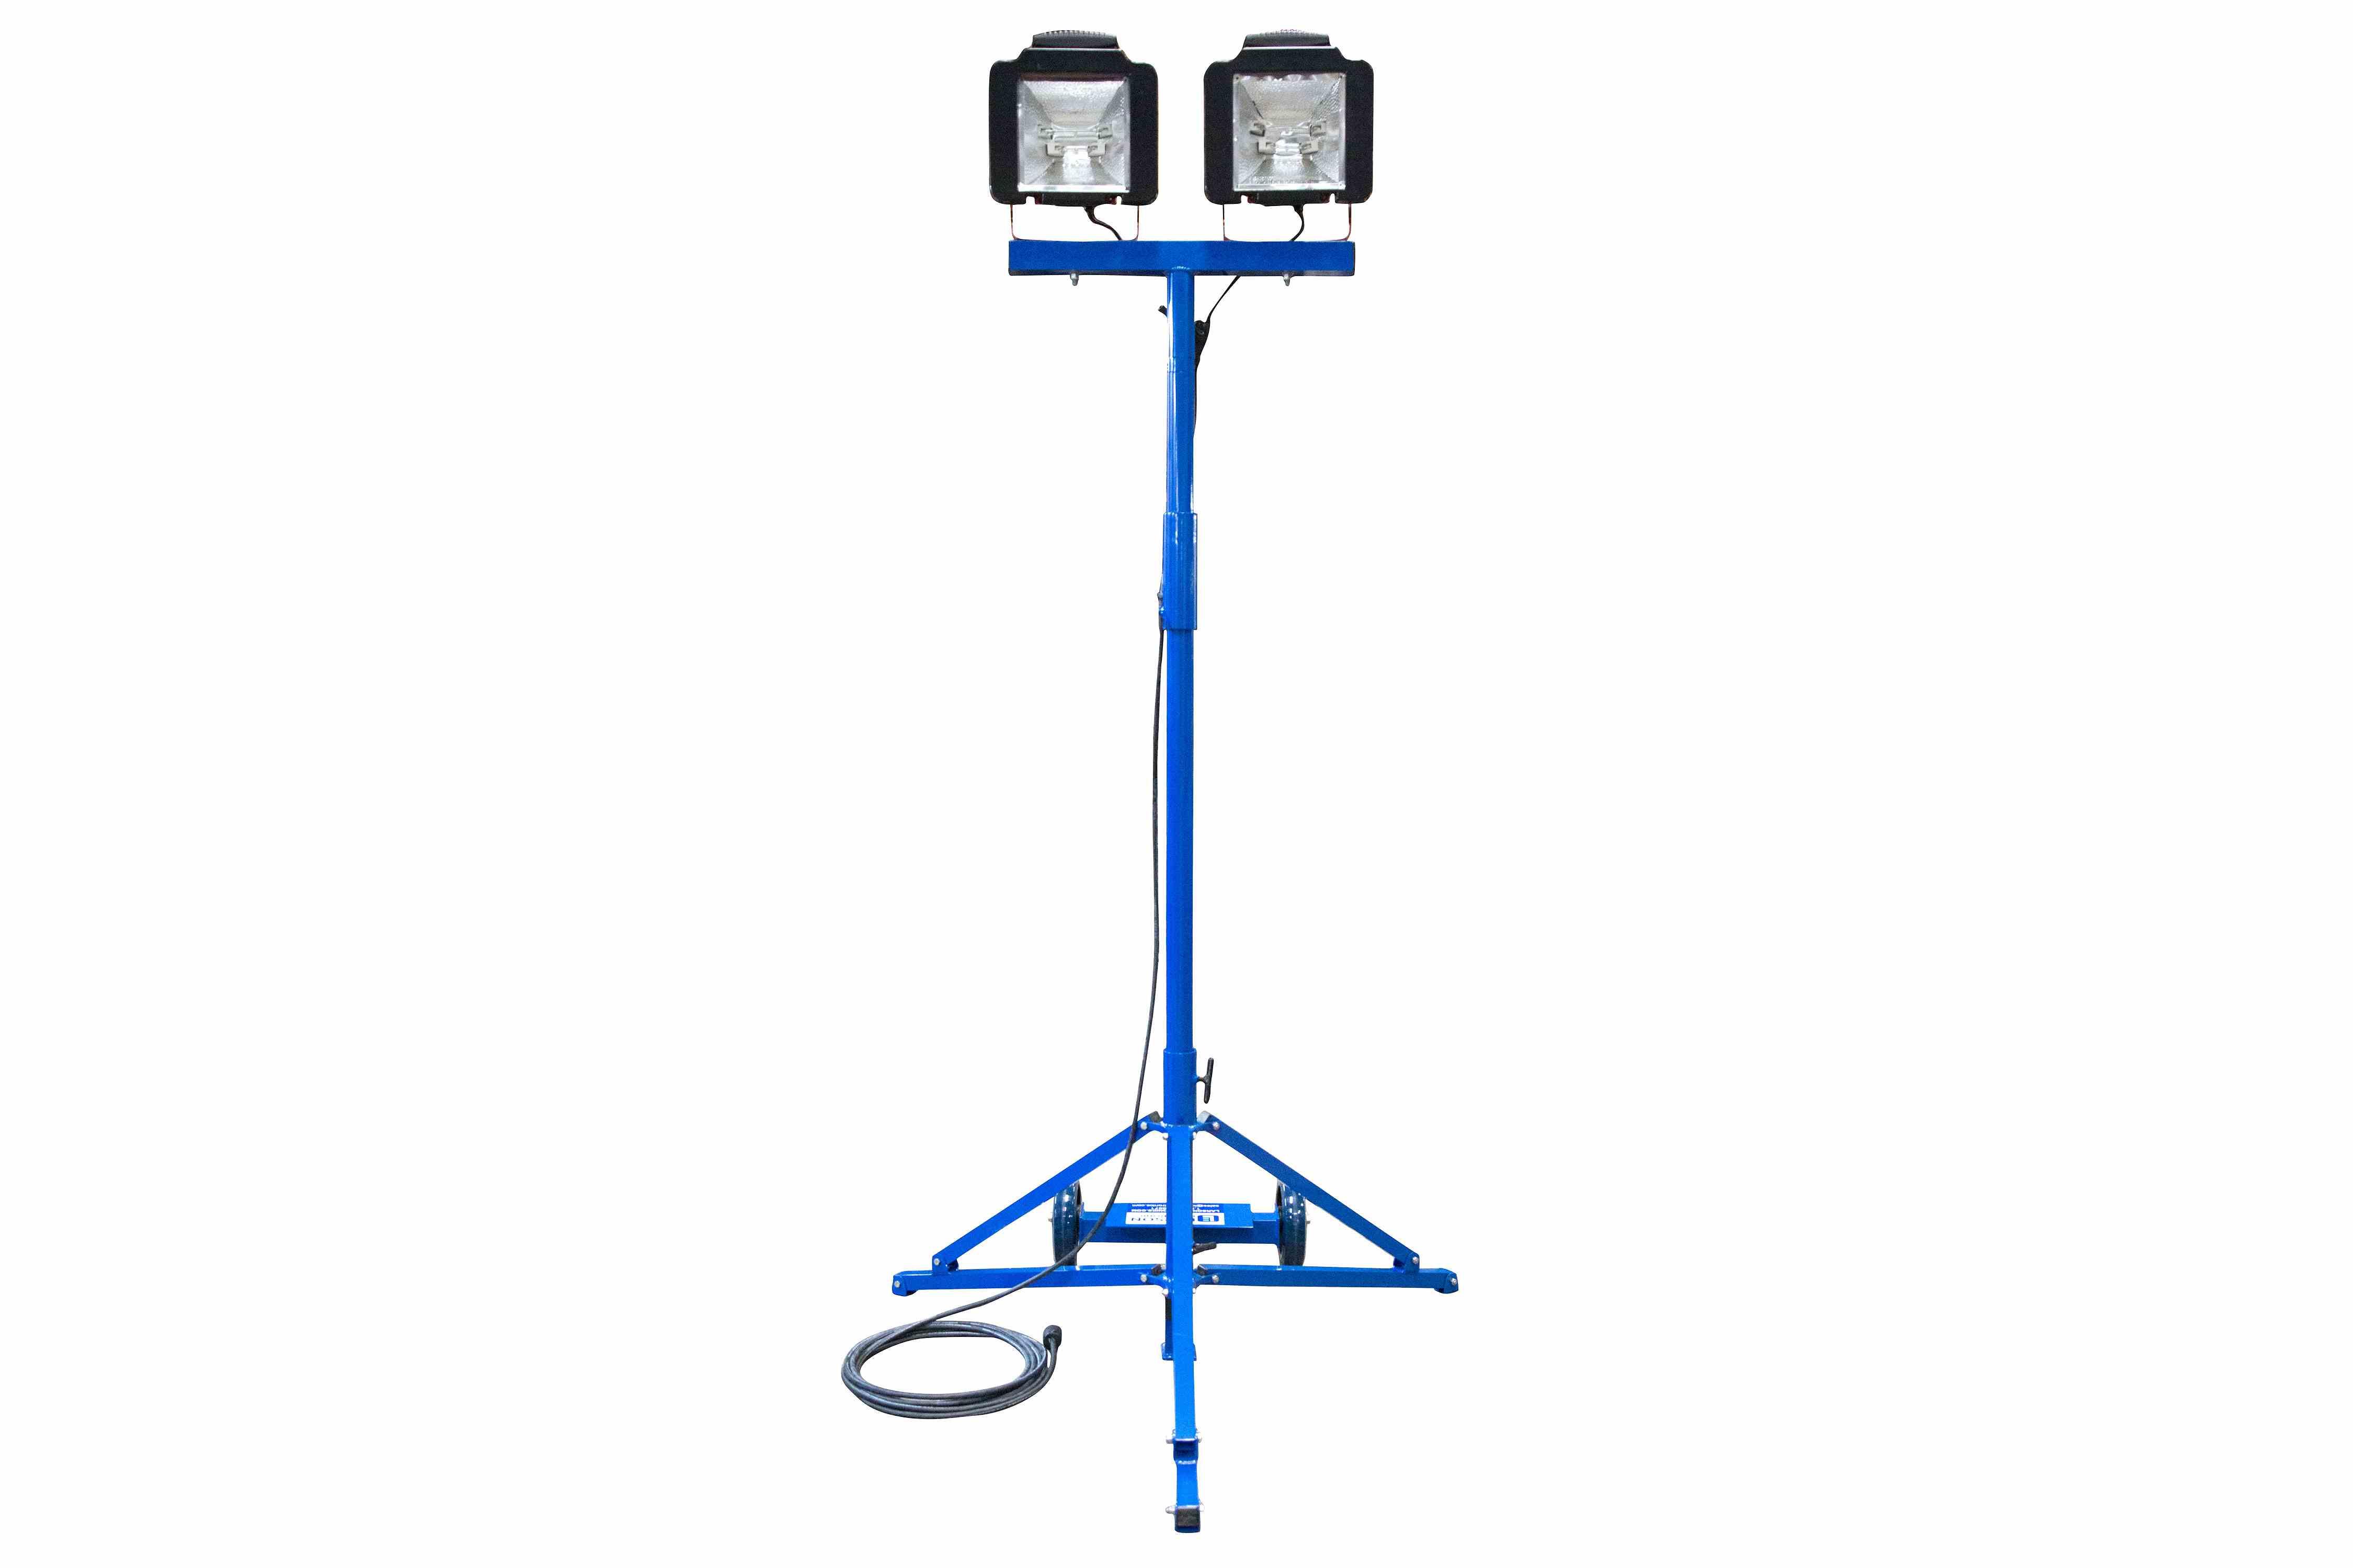 work area flood light - quadpod mount